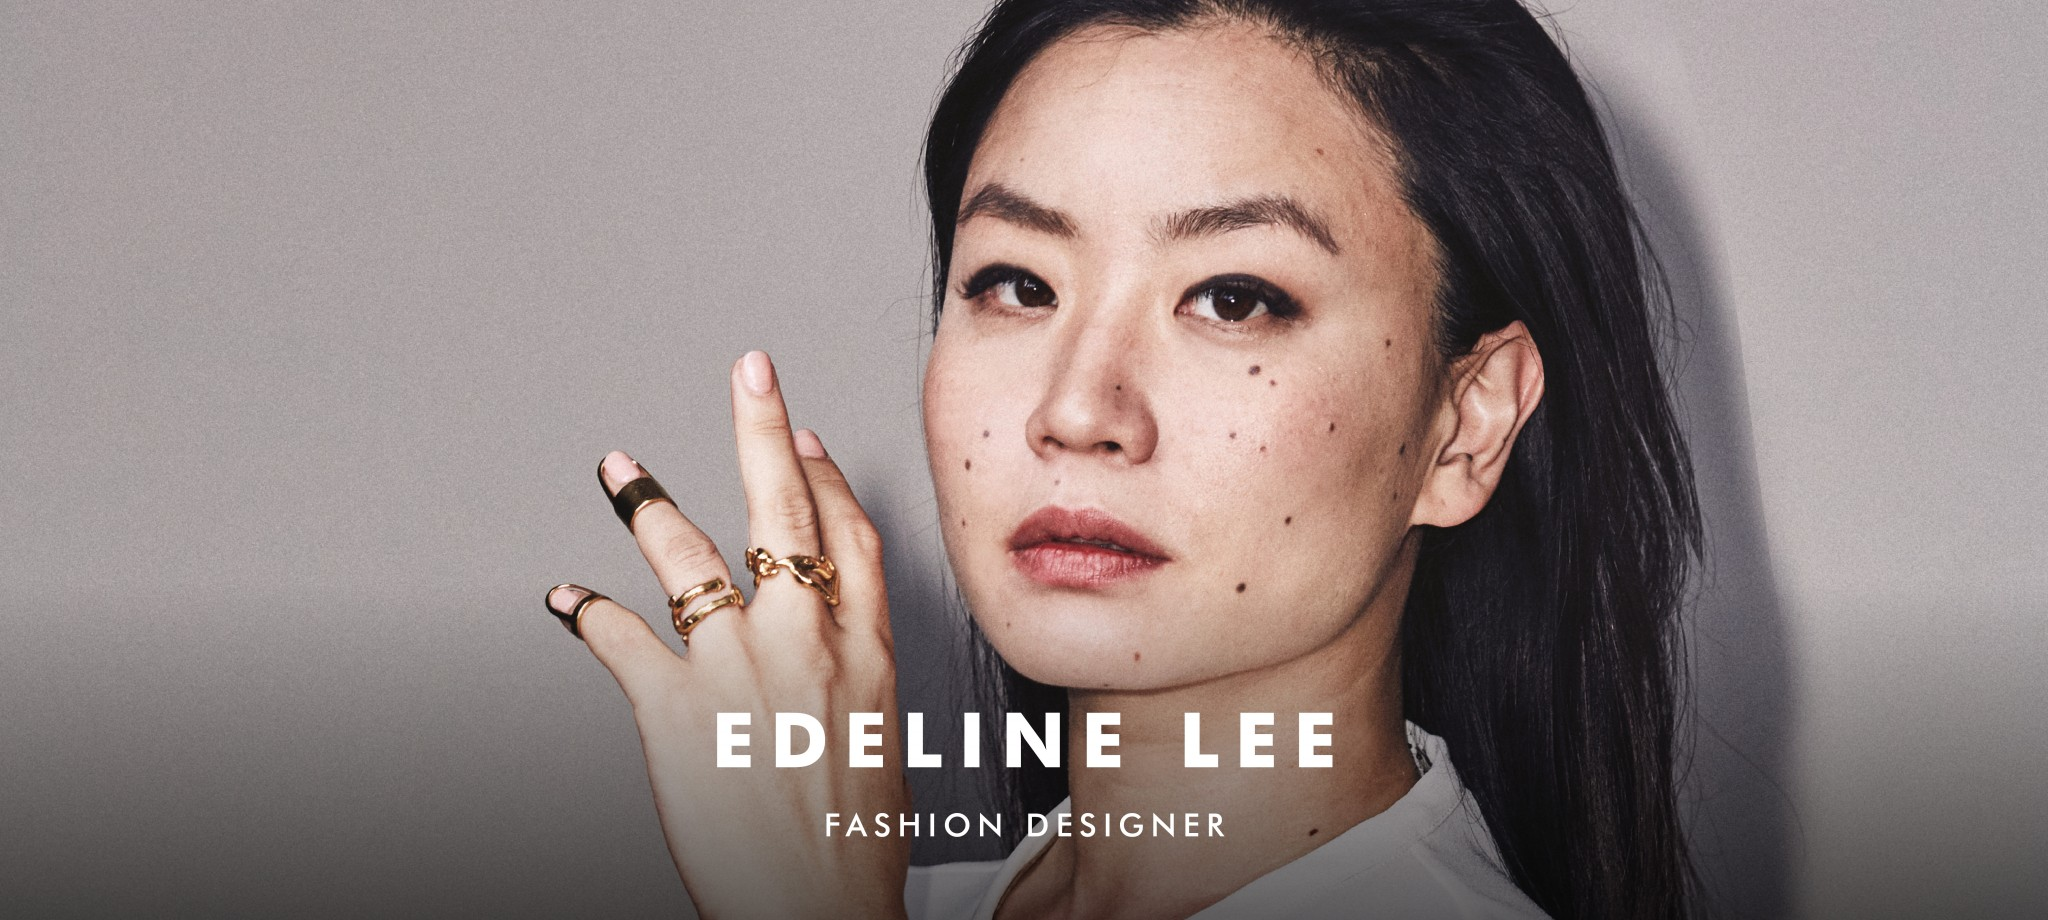 Edeline banner 1